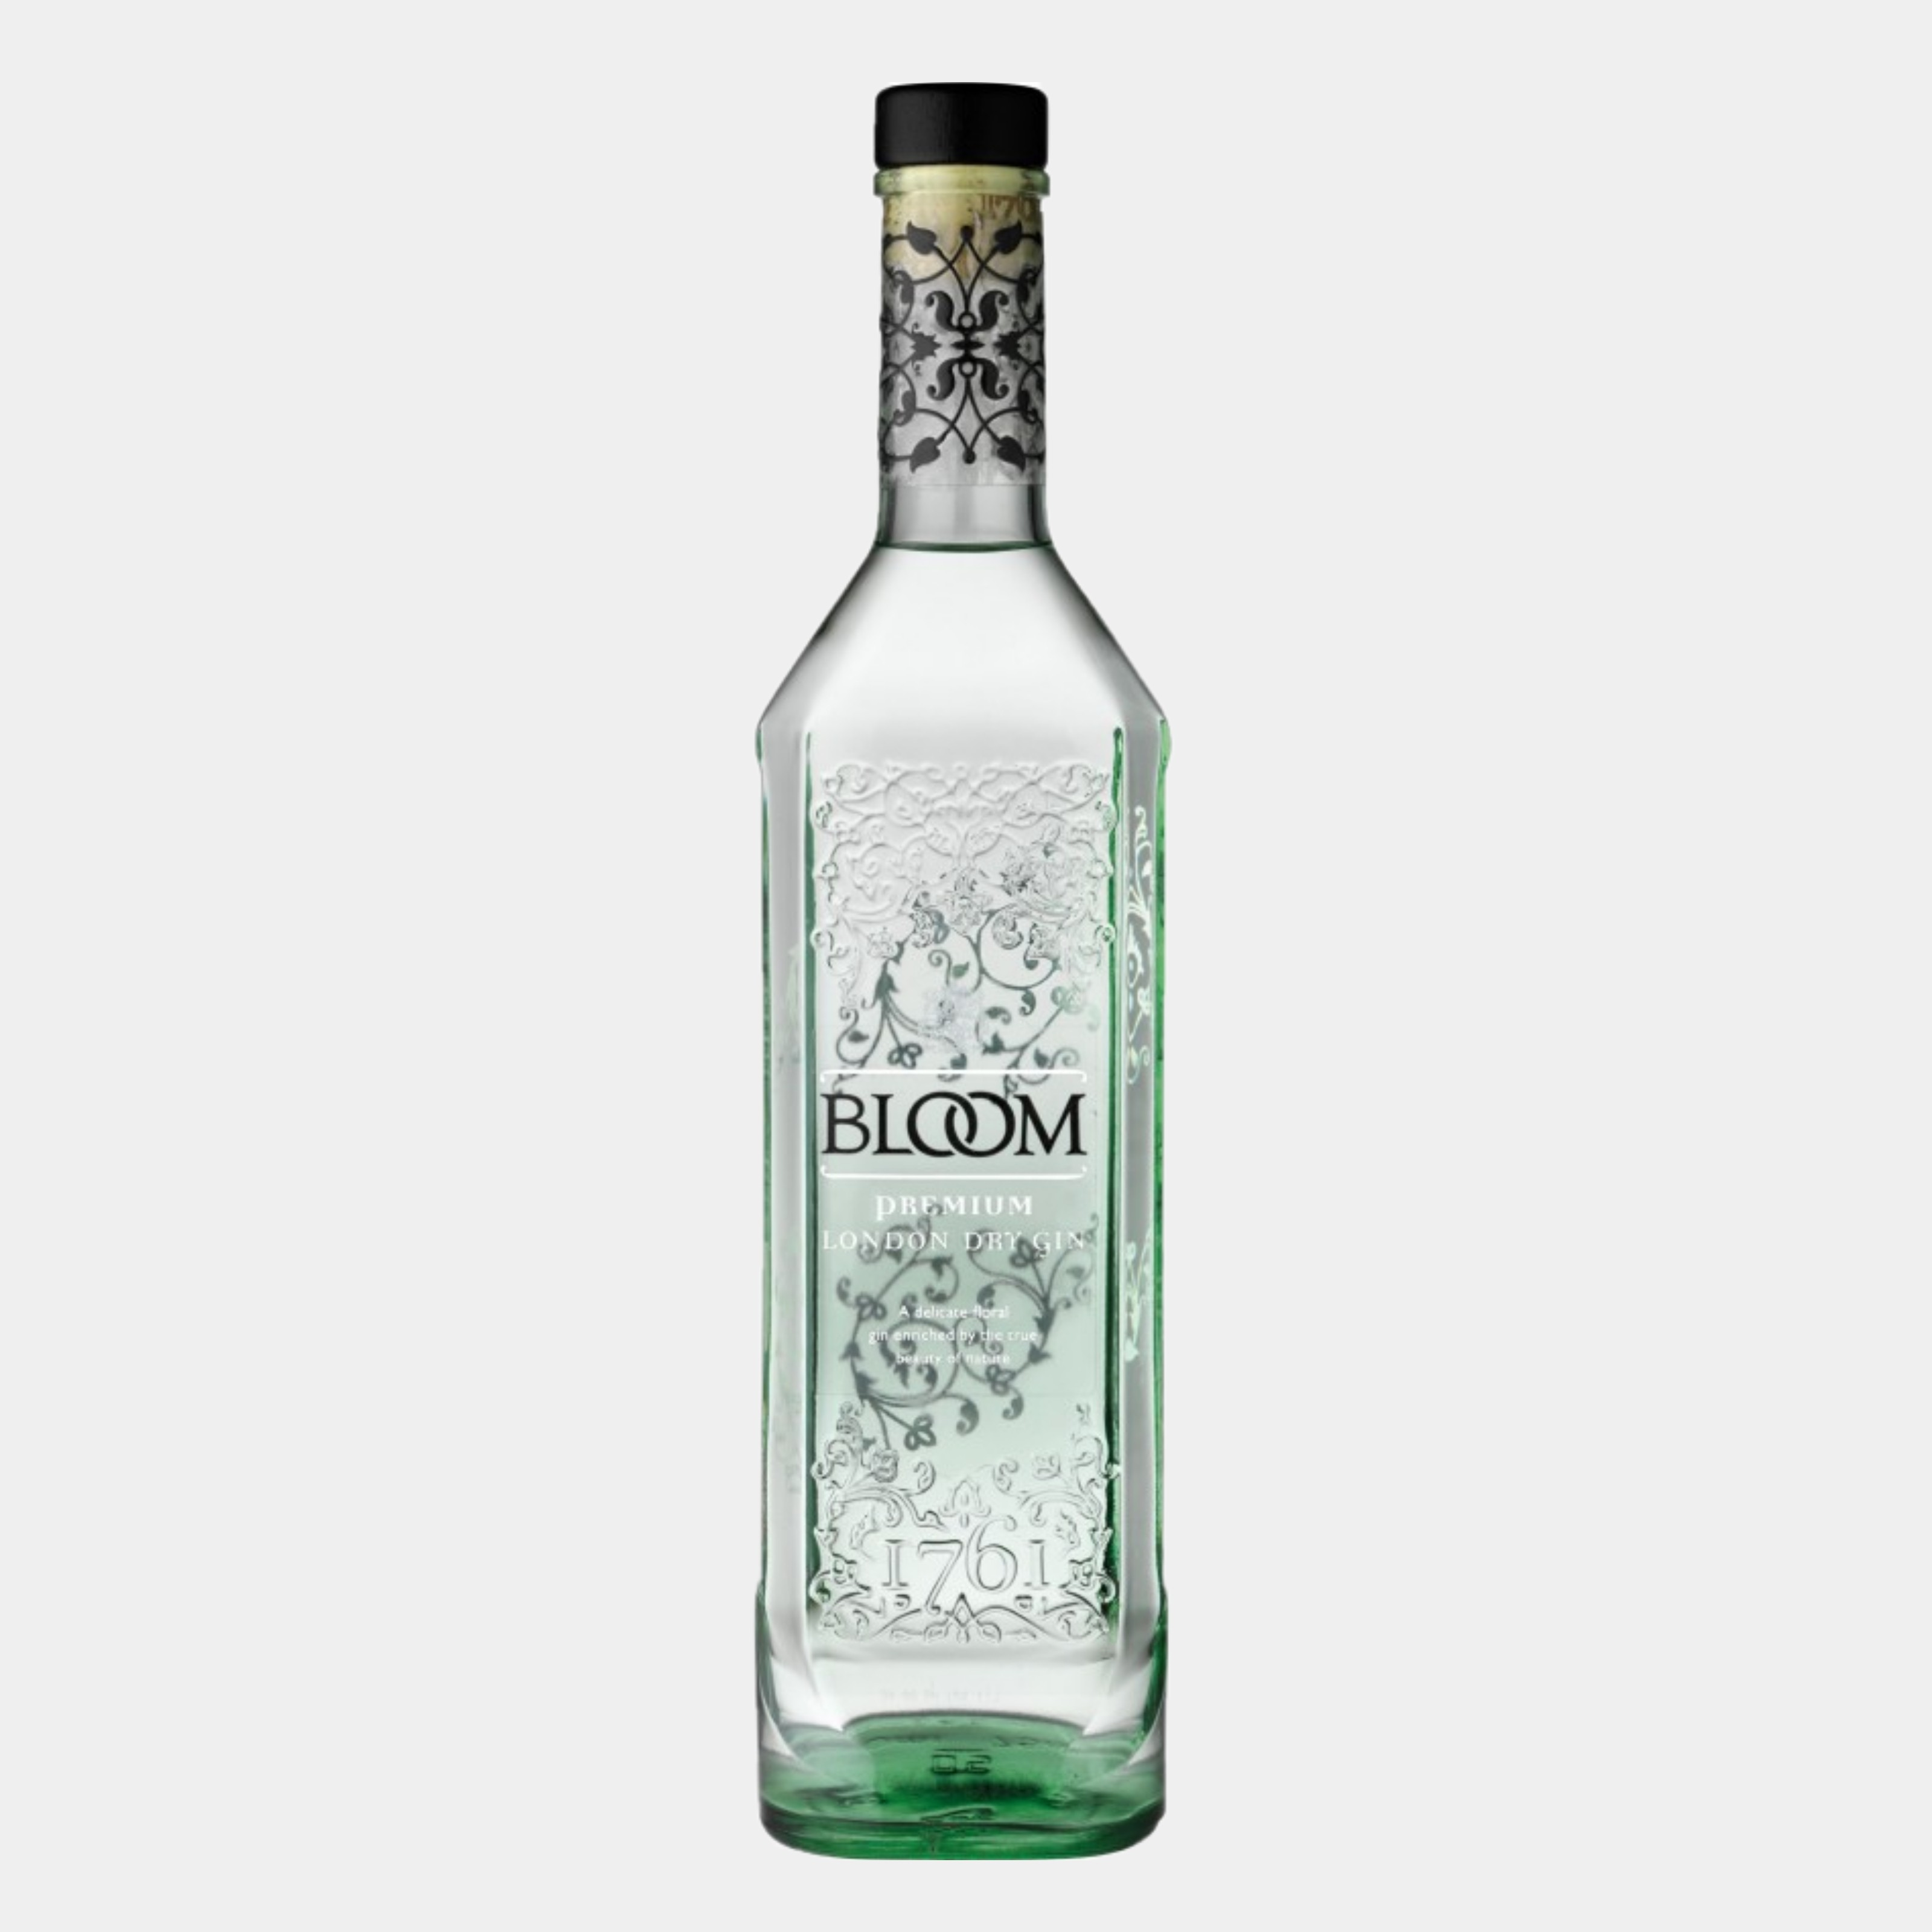 Bloom Premium London Dry Gin 0.7L 40% Alk.